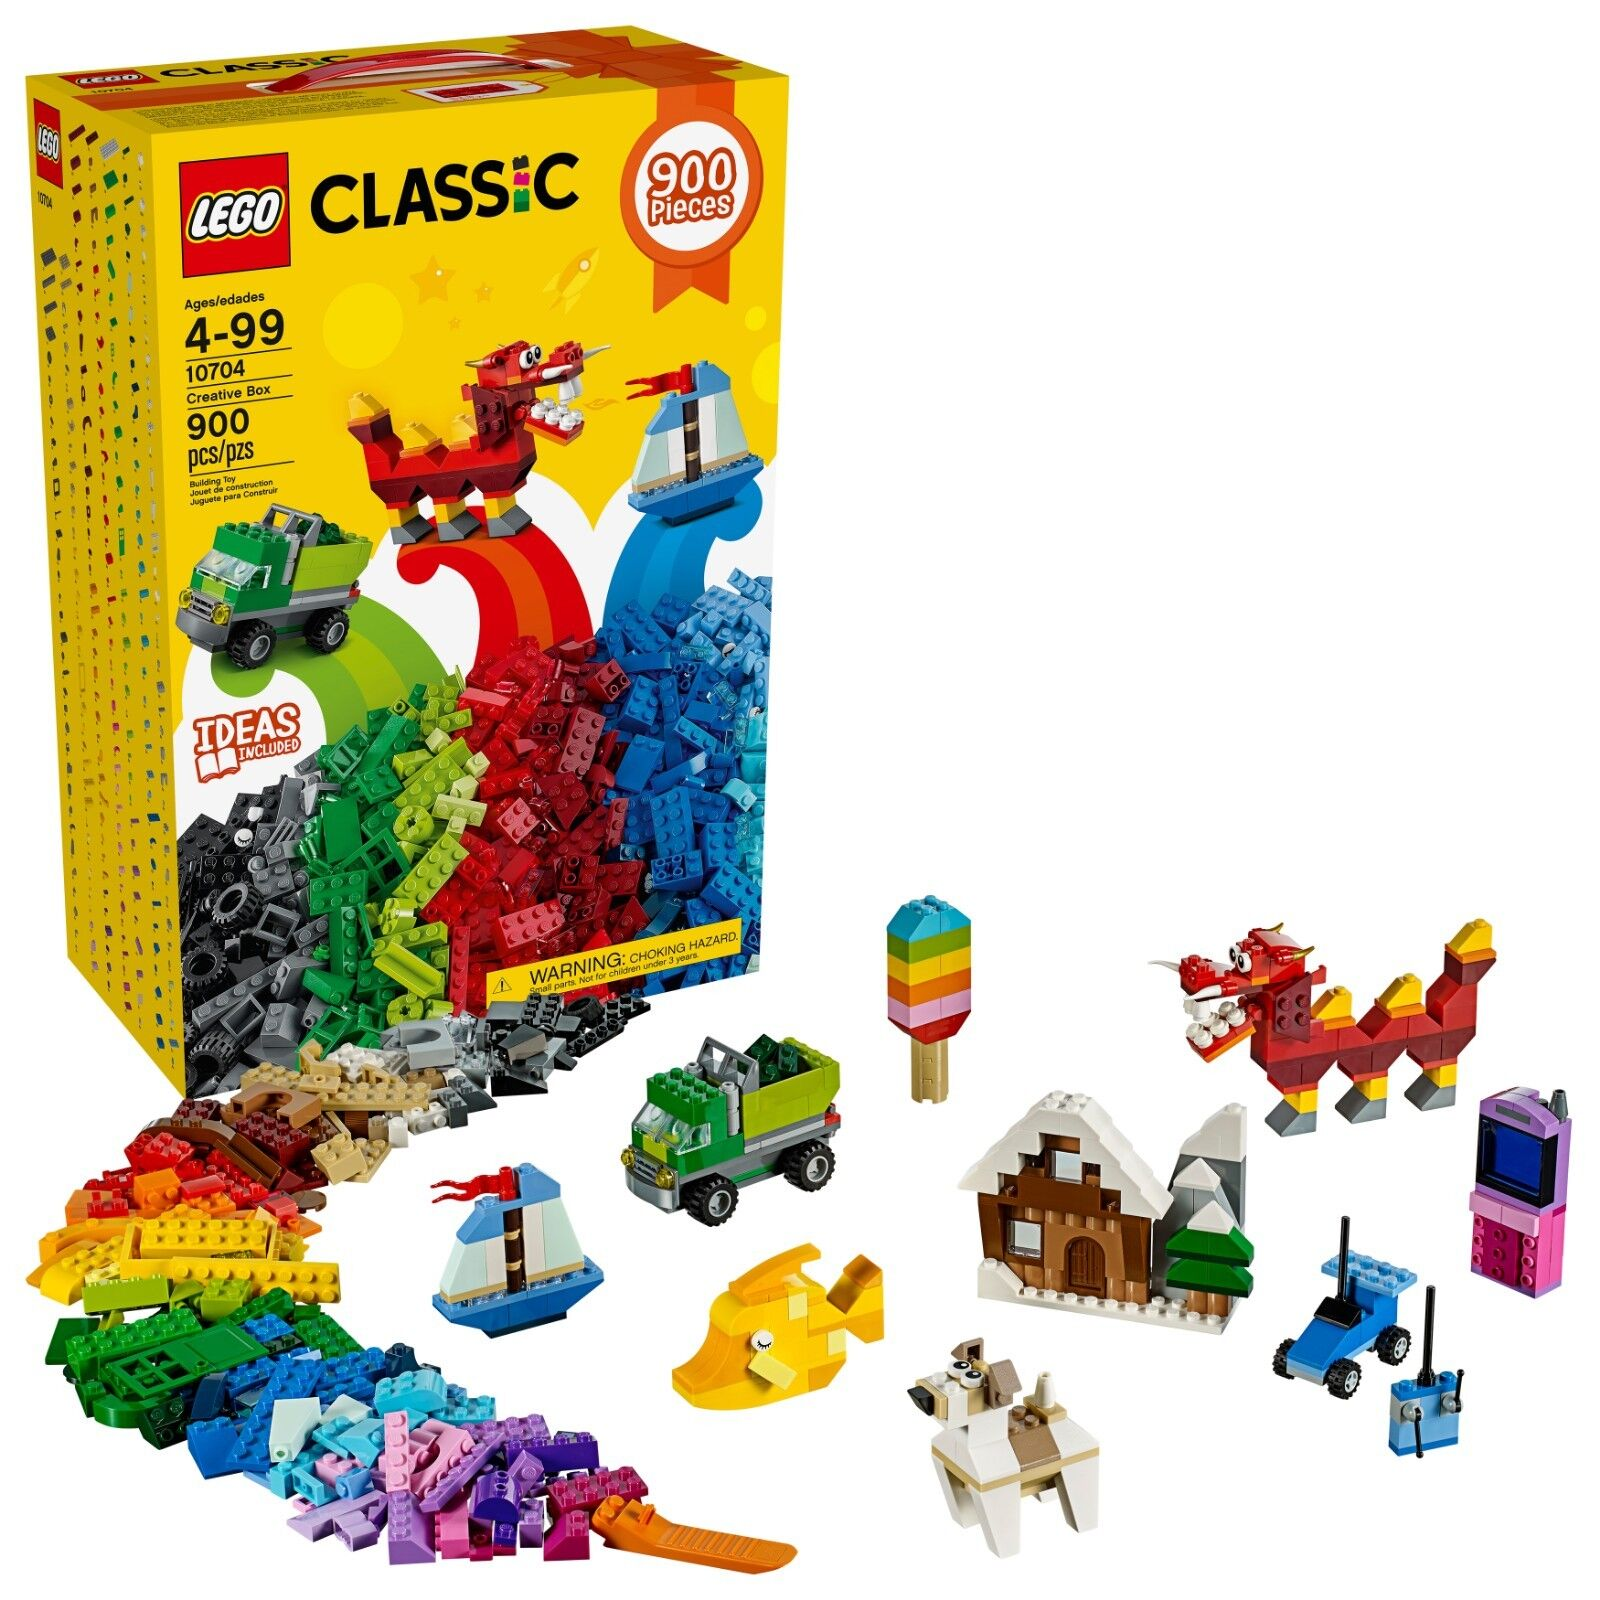 Lego Classic Creative Box 10704 - 900 Pieces - 39 colors